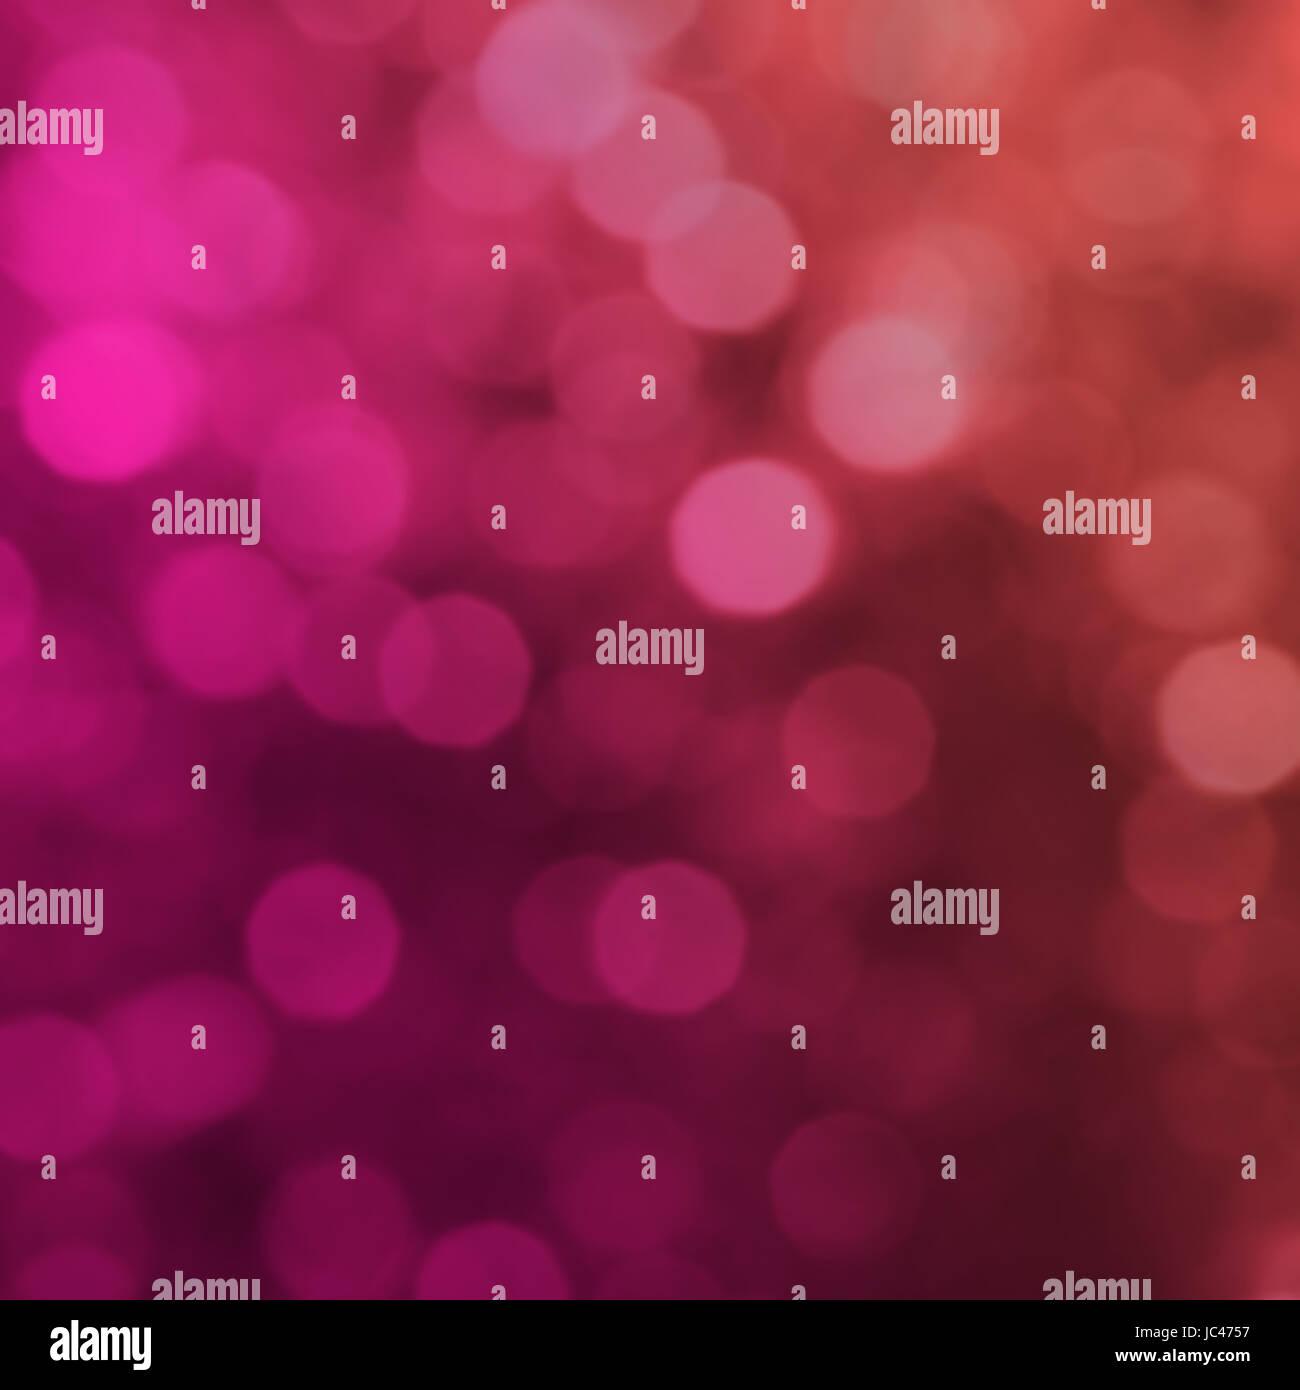 Festive background with shining effect - Stock Image